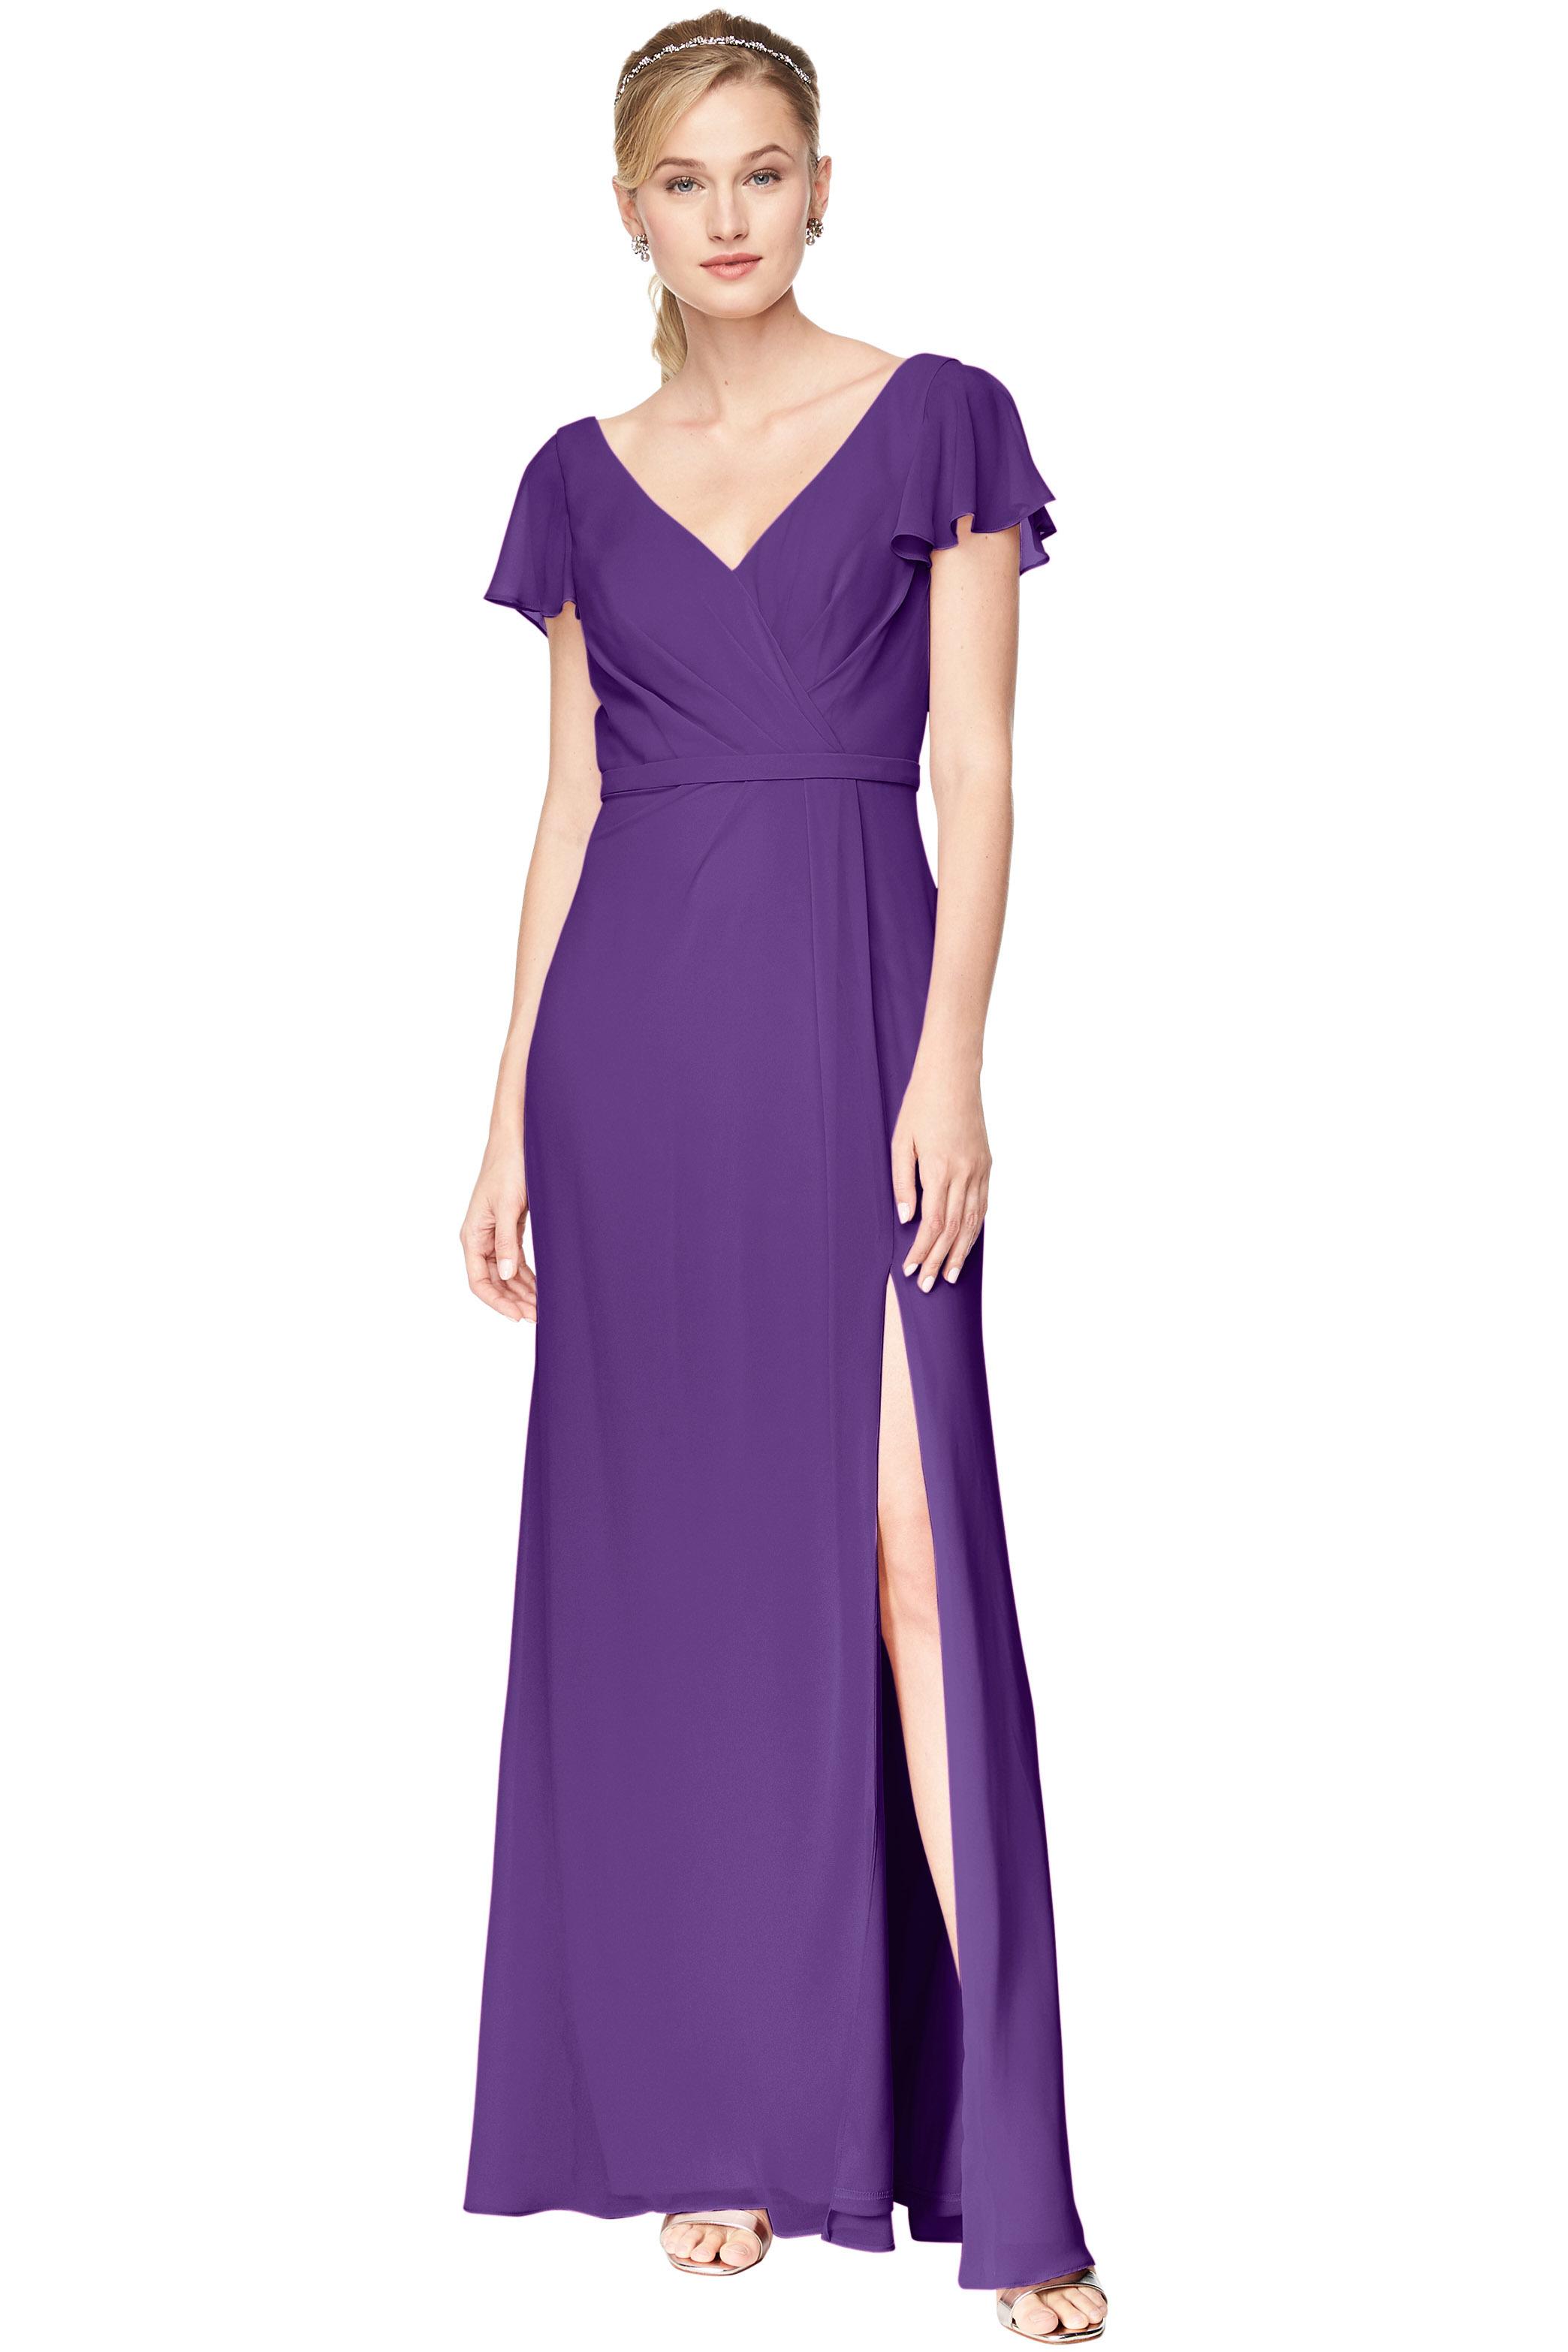 Bill Levkoff Regency Chiffon V-Neck A-Line gown, $184.00 Front